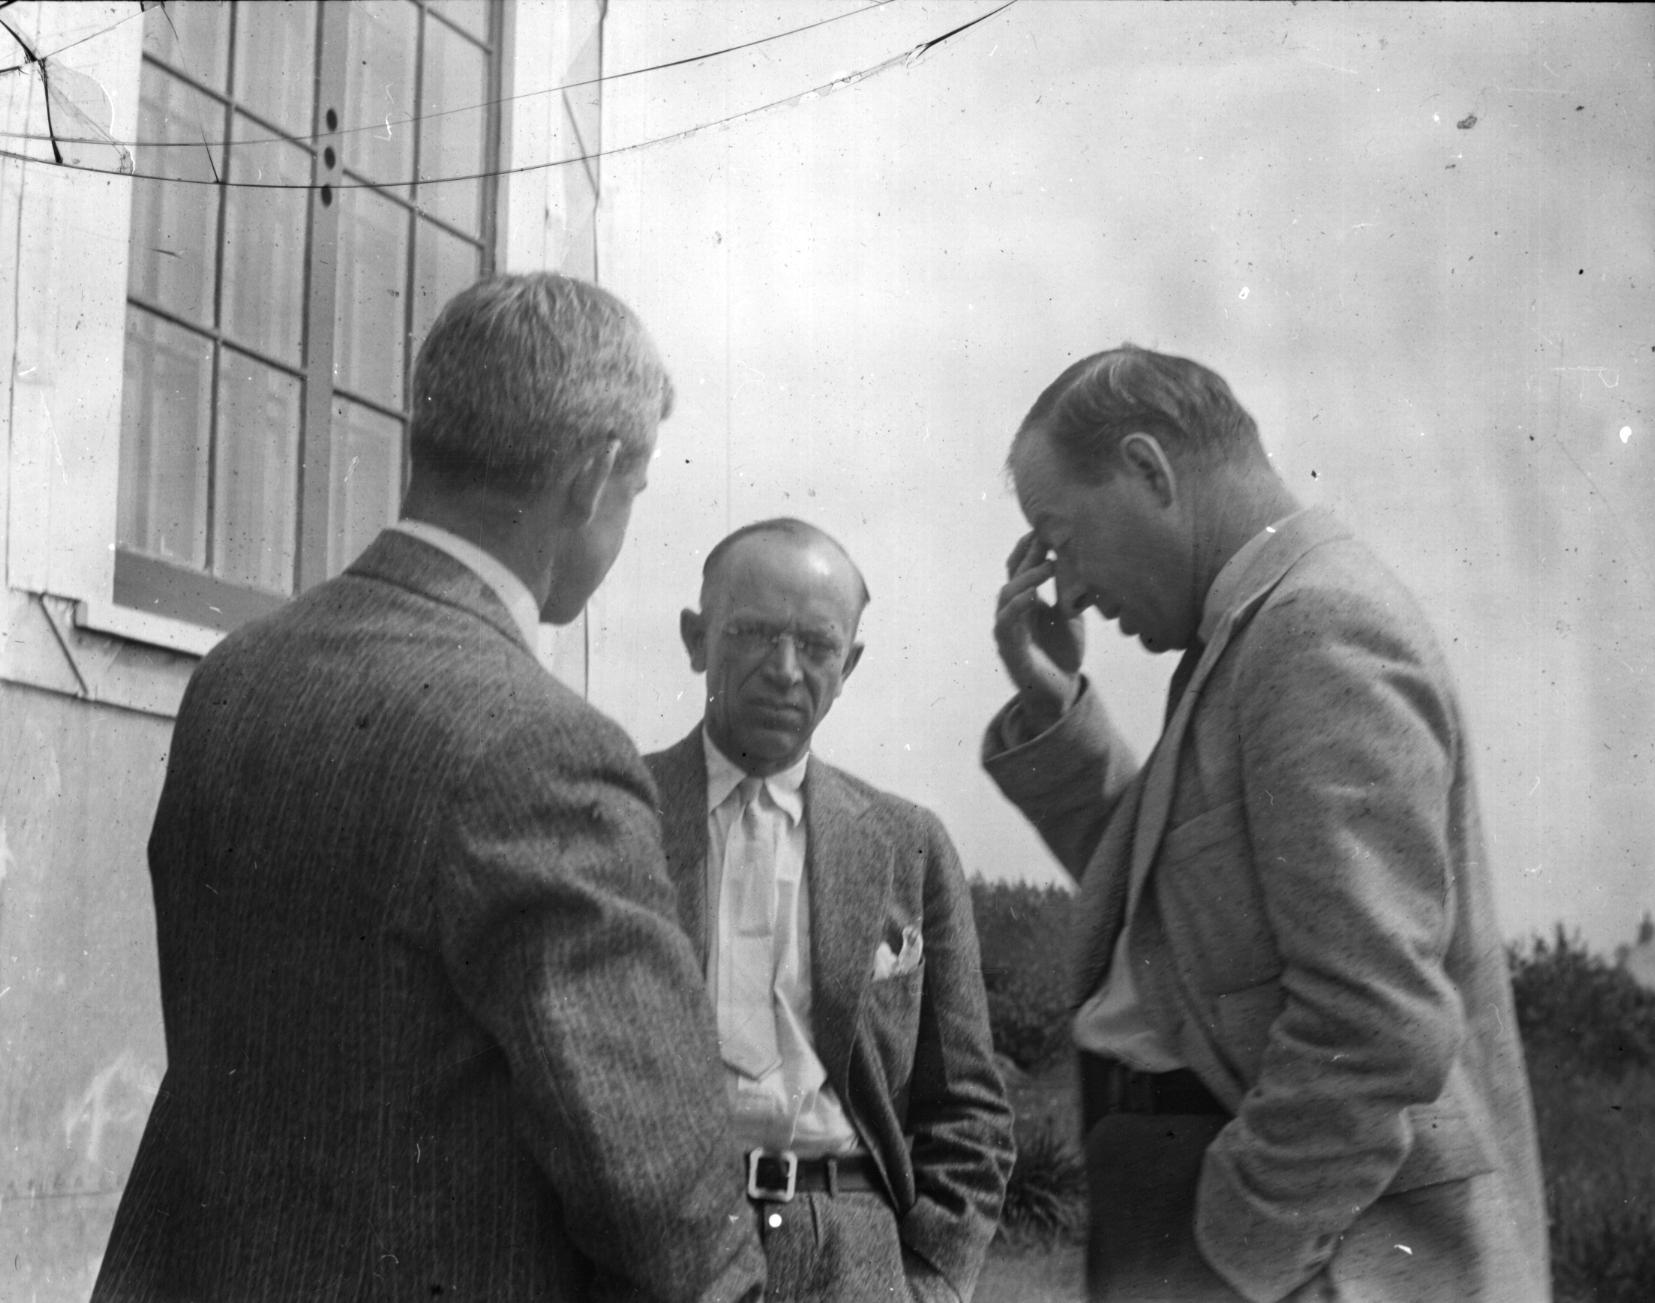 Dr. A.G. Huntsman, Aldo Leopold, and H.E. Anthony